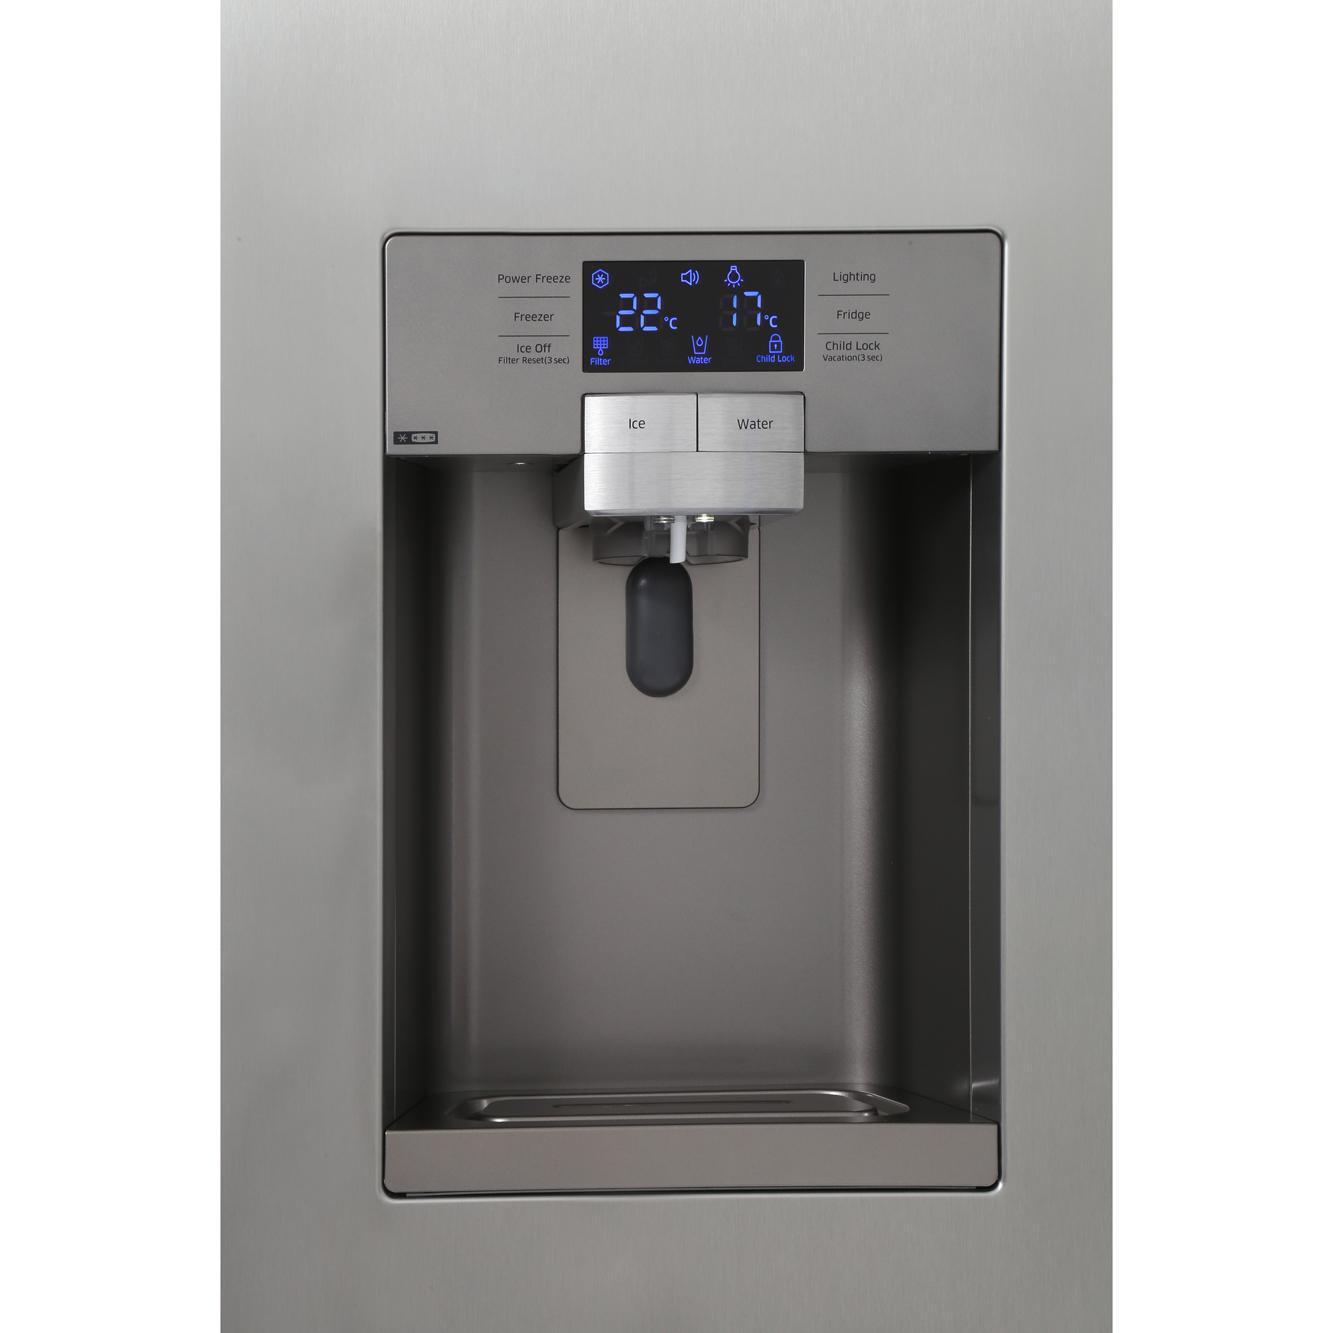 Buy Samsung Rsg5ucsl American Fridge Freezer Stainless